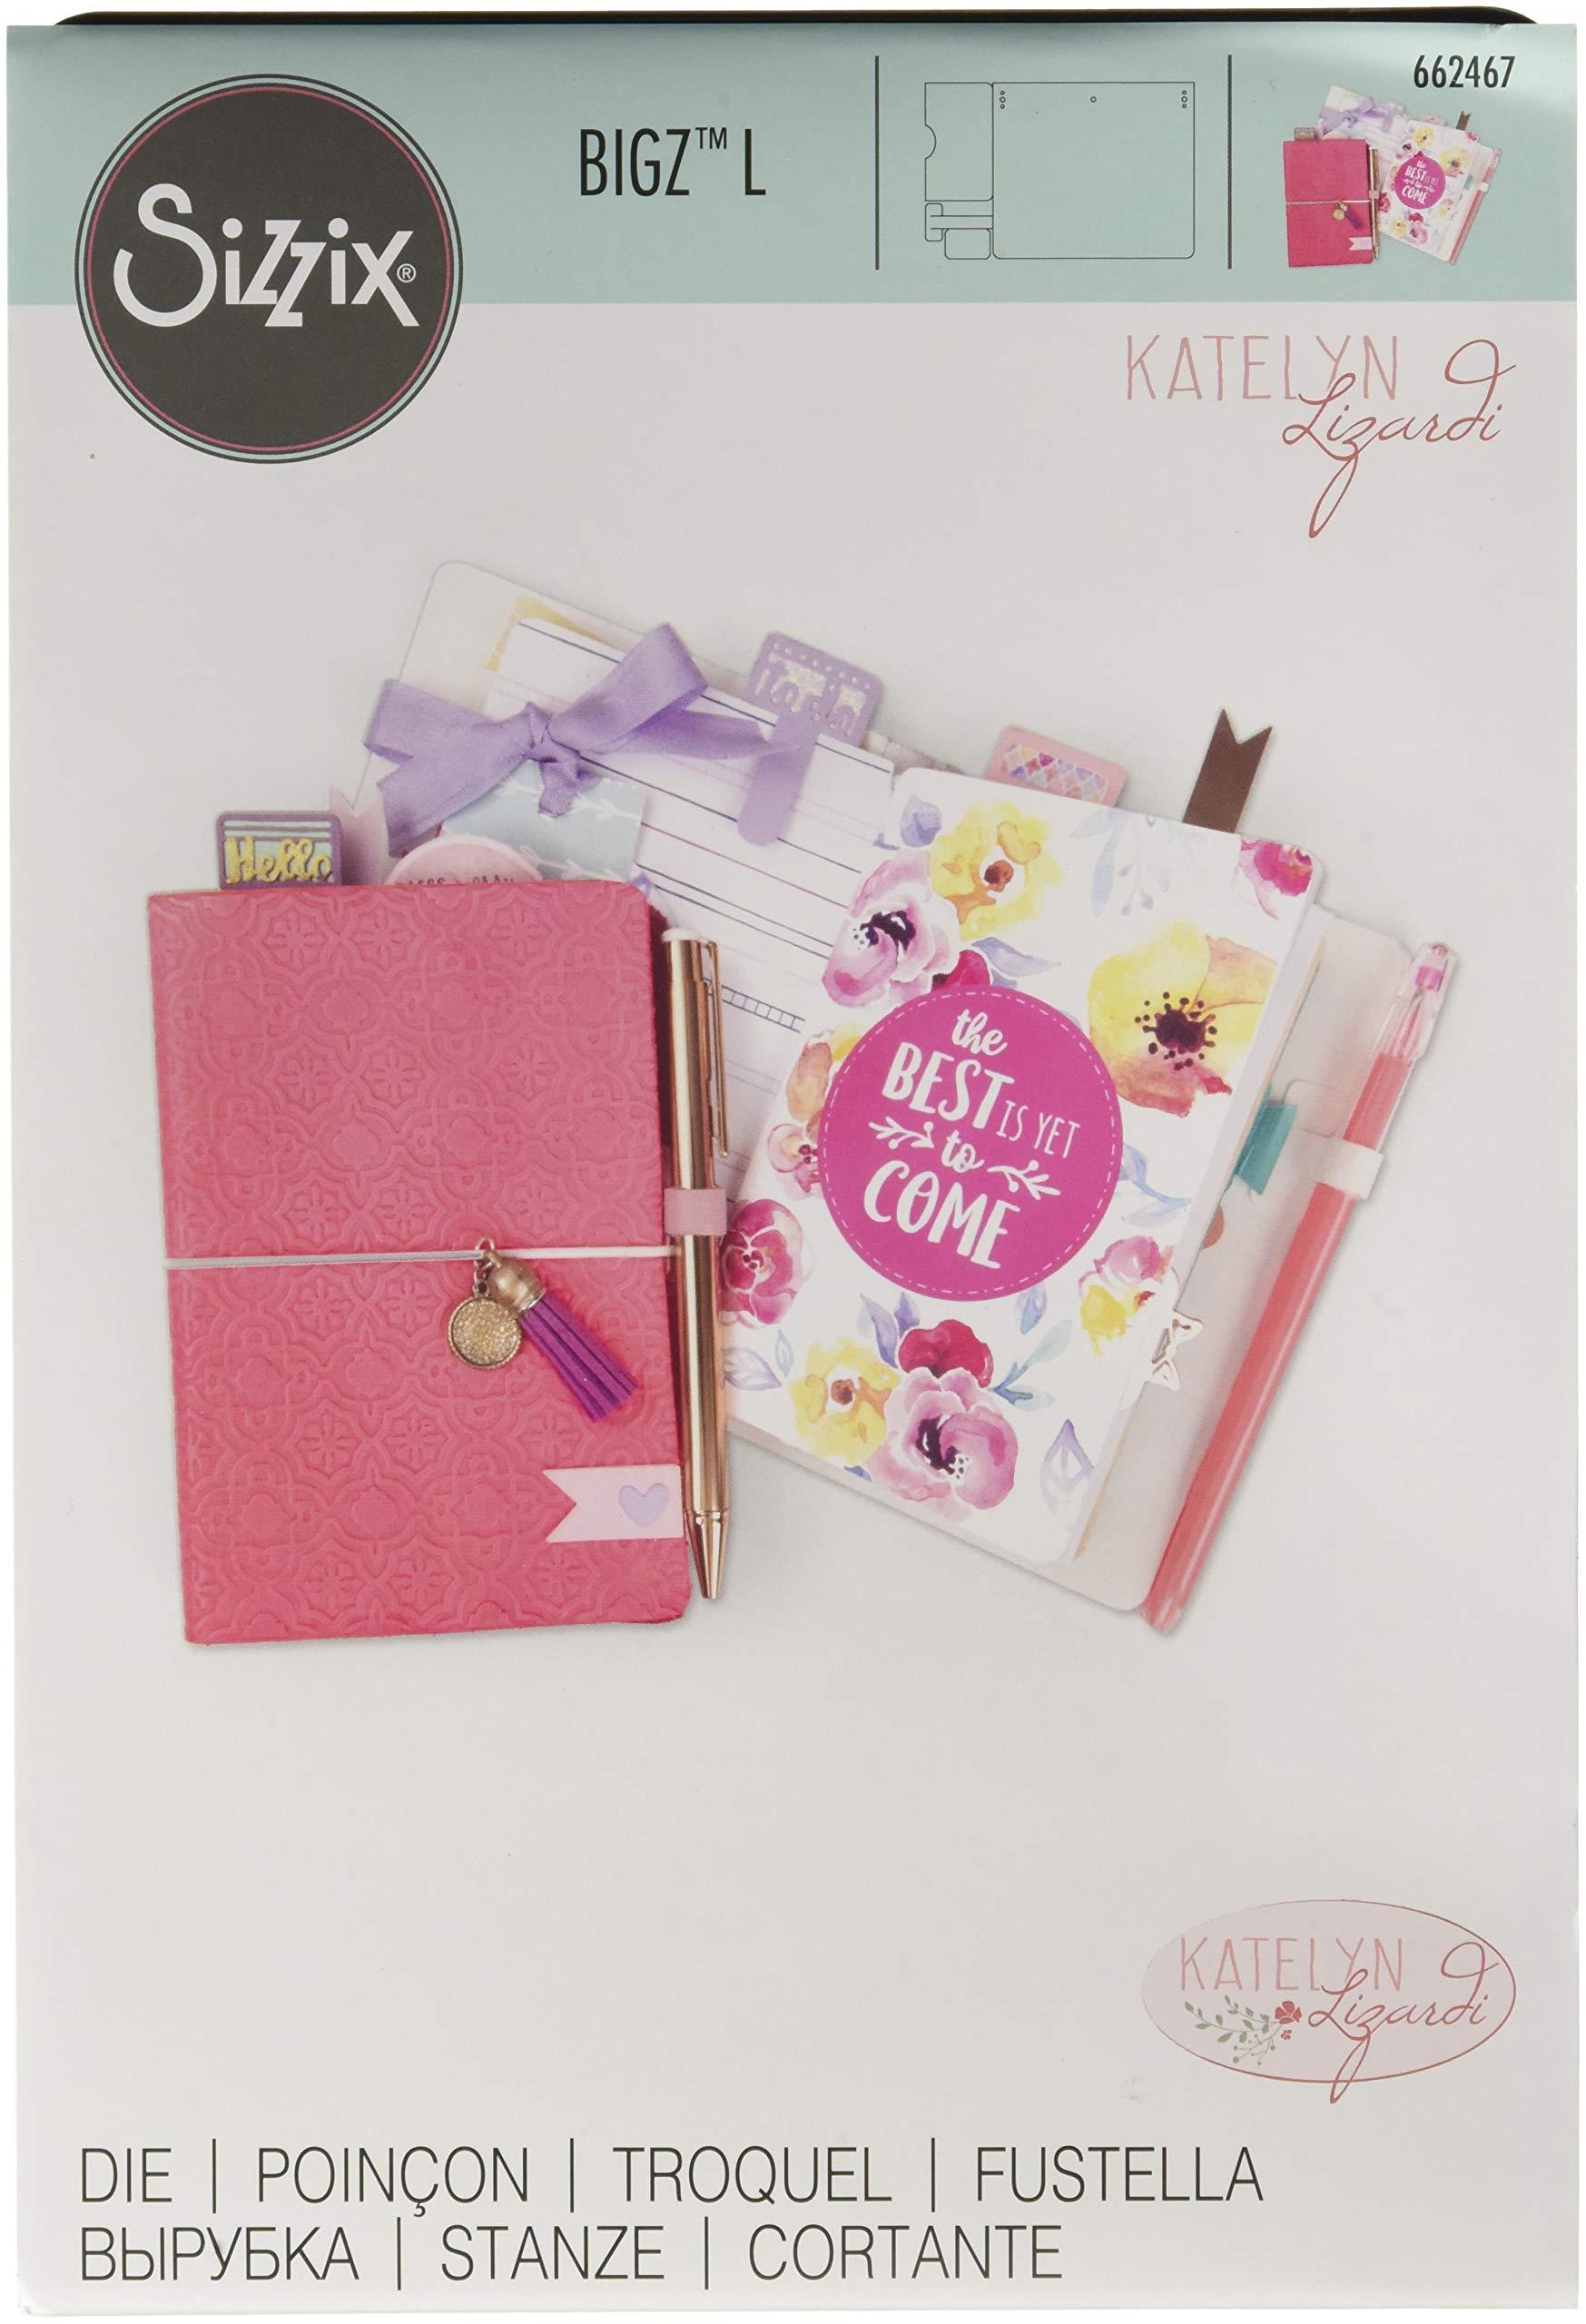 Sizzix 662467 Bigz L Die By Katelyn Lizardi Pocket Traveler'S Notebook, Multicolor